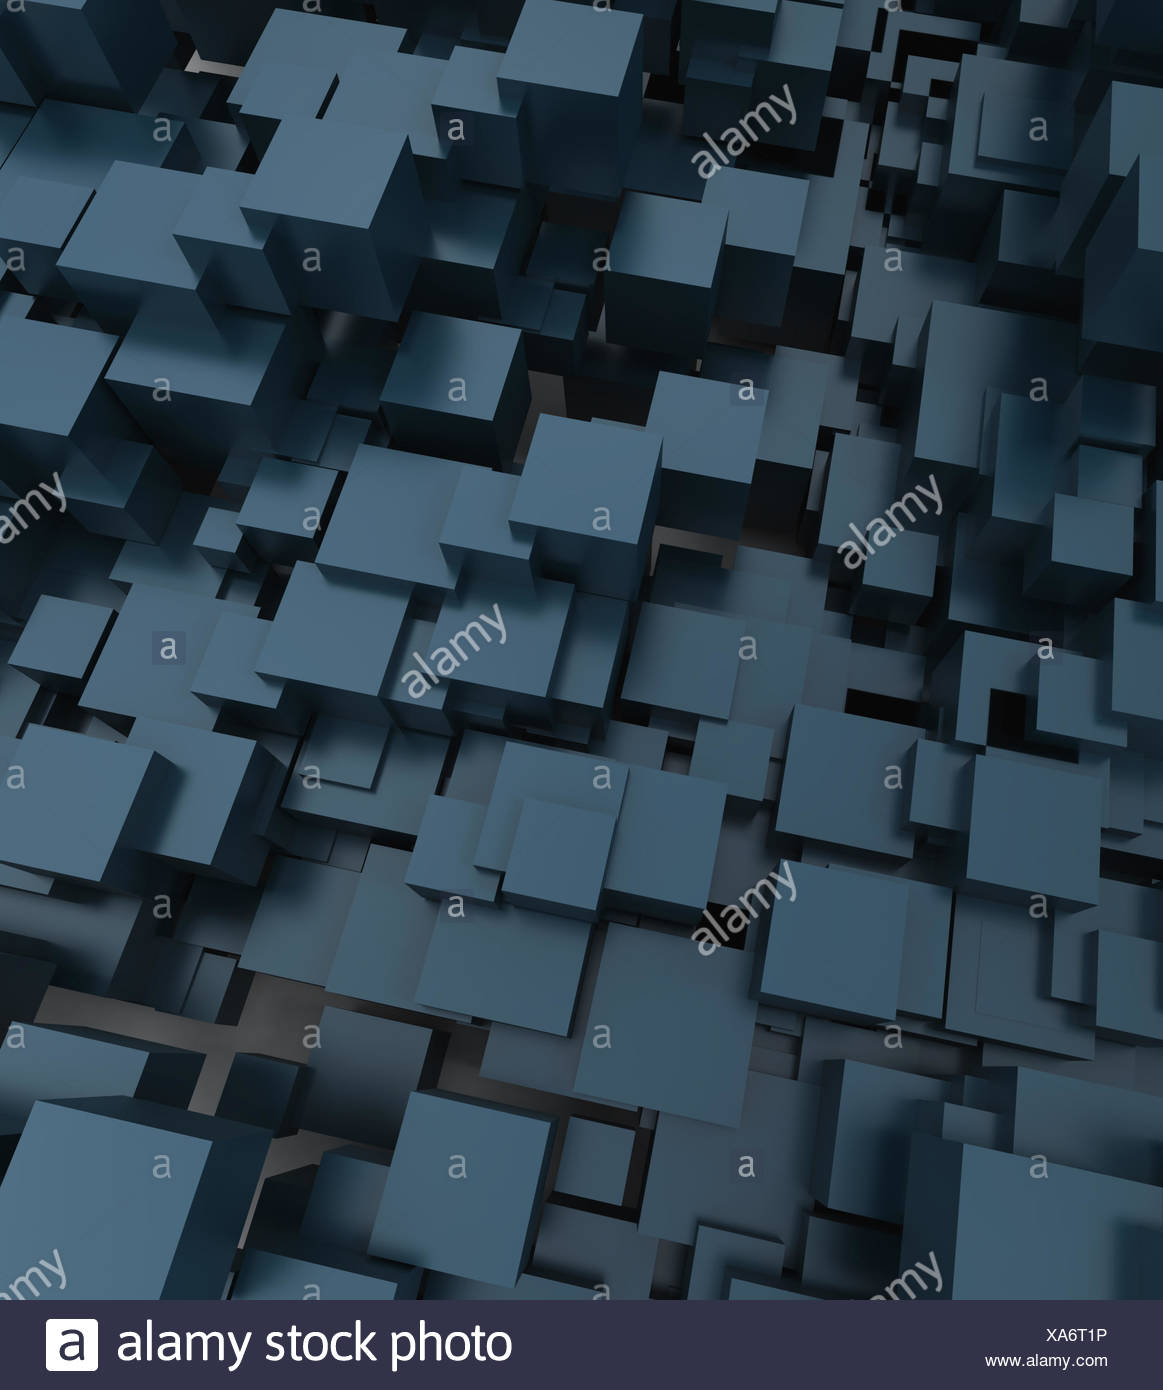 Blue Art Shape Abstract Wallpaper Pattern Cube